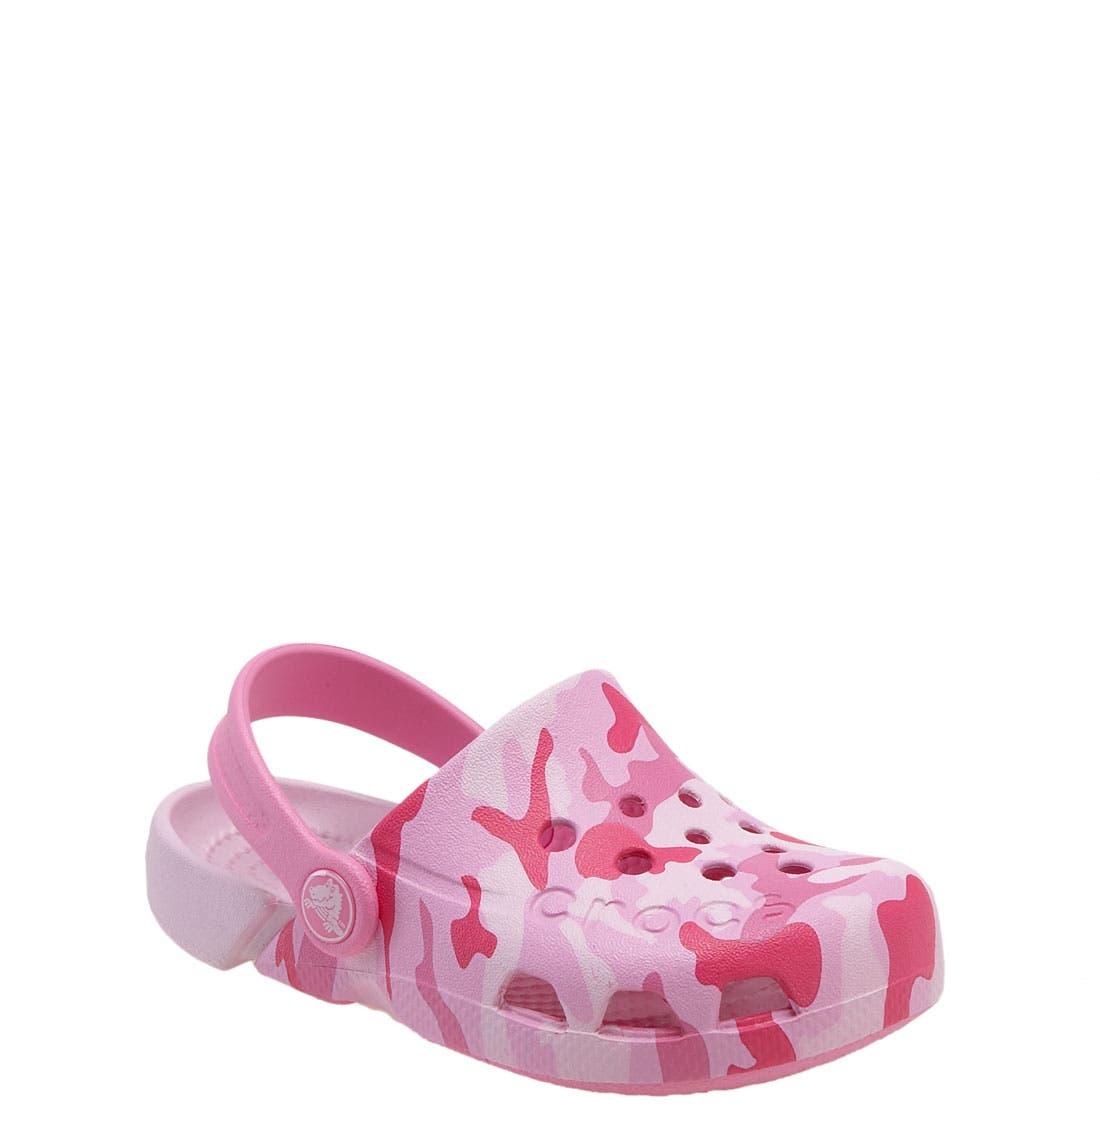 Main Image - CROCS™ 'Electro' Sandal (Baby, Walker, Toddler & Little Kid)